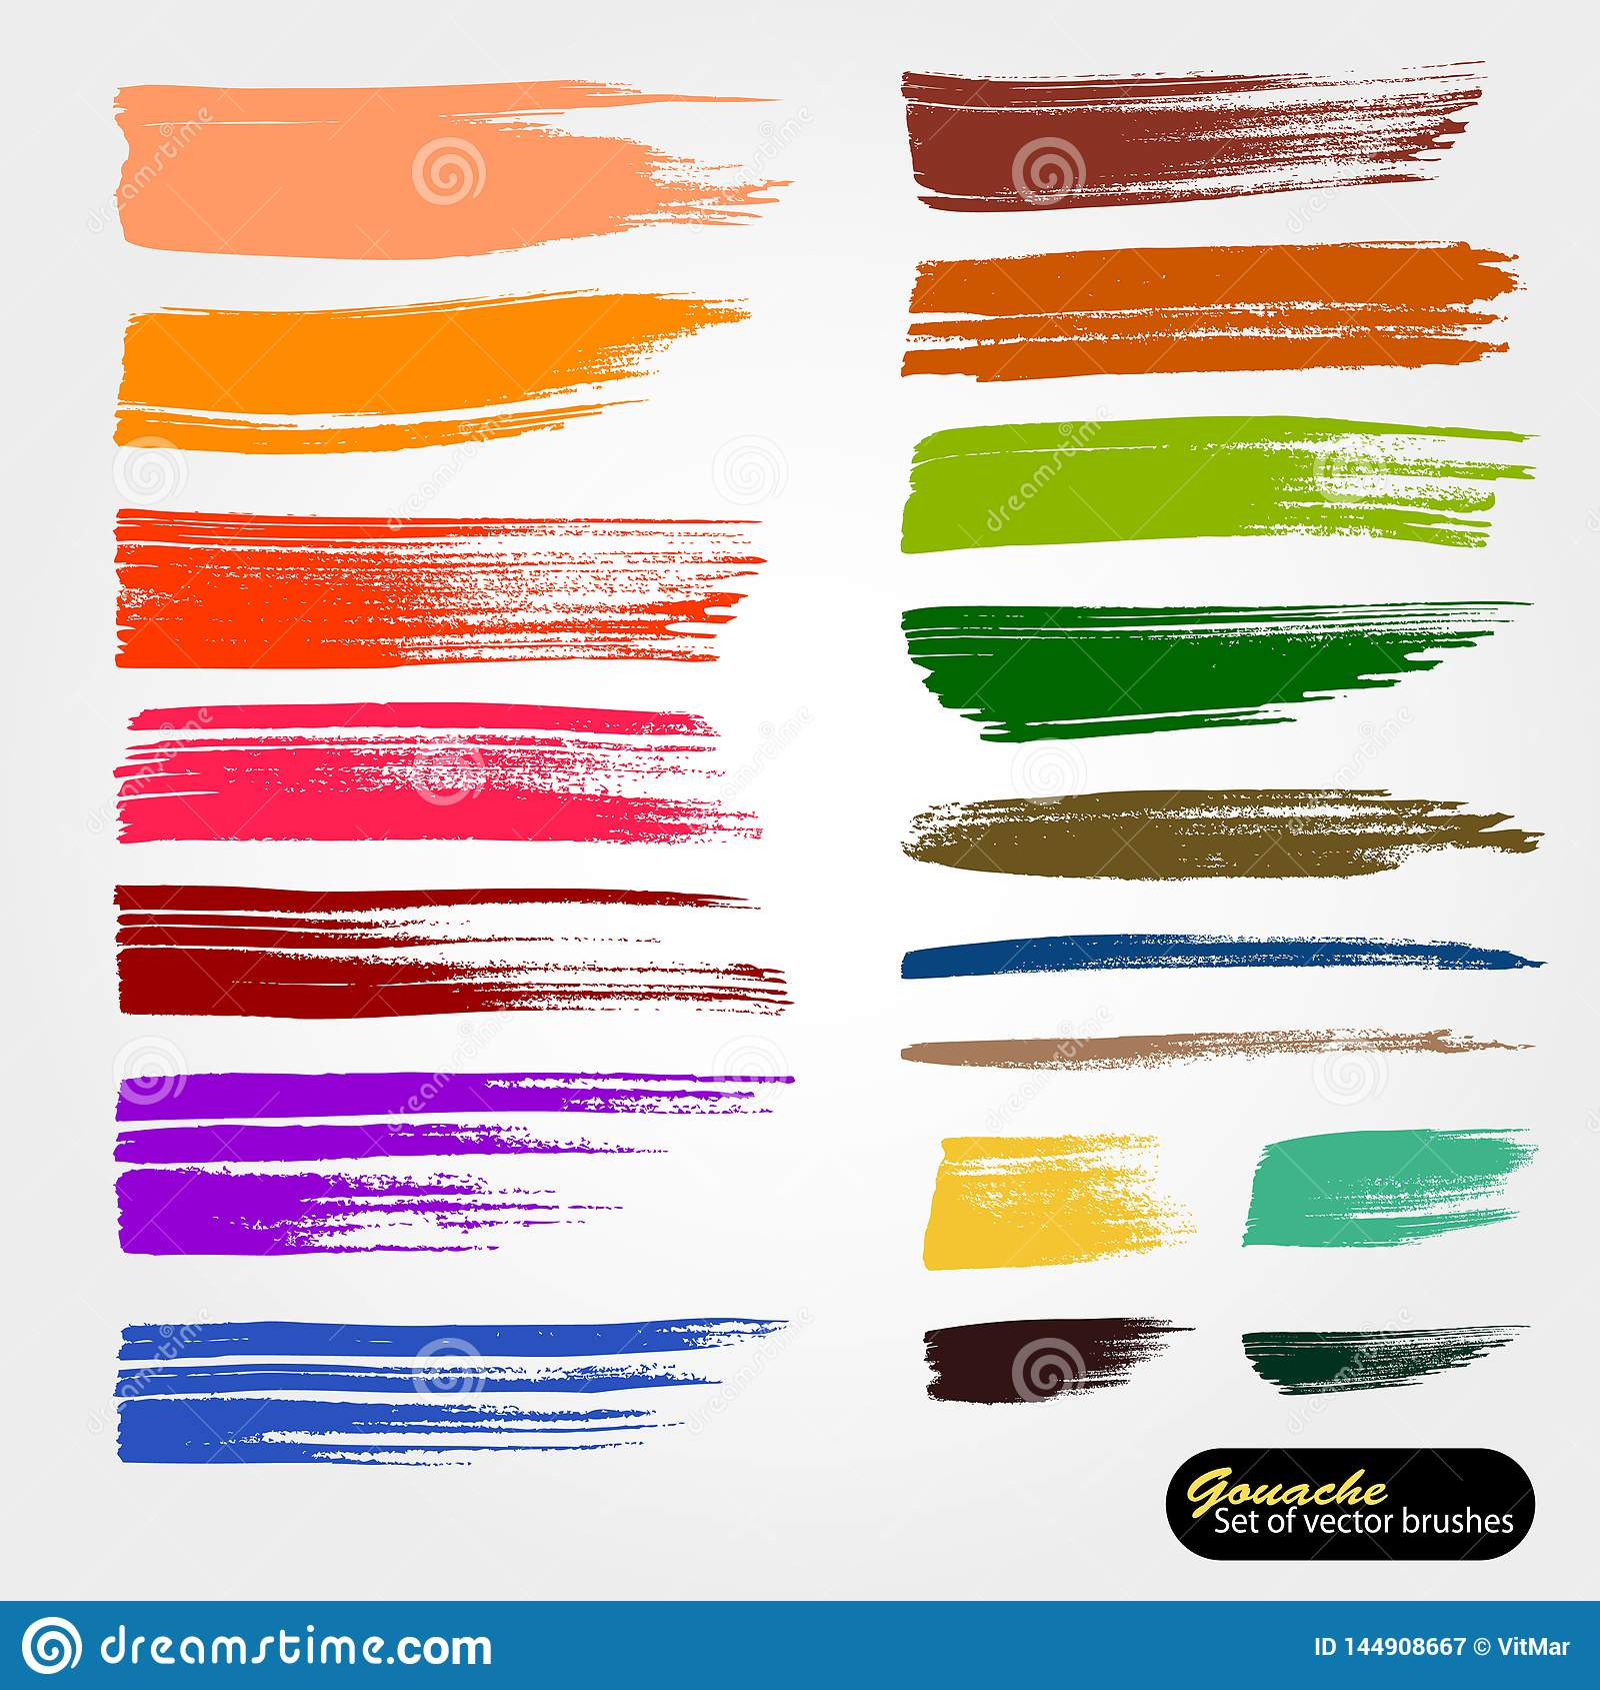 R Sparade palettmappborstar Kul?r m?larf?rg, akrylborste, gouasheborsteslagl?ngd, linje eller textur